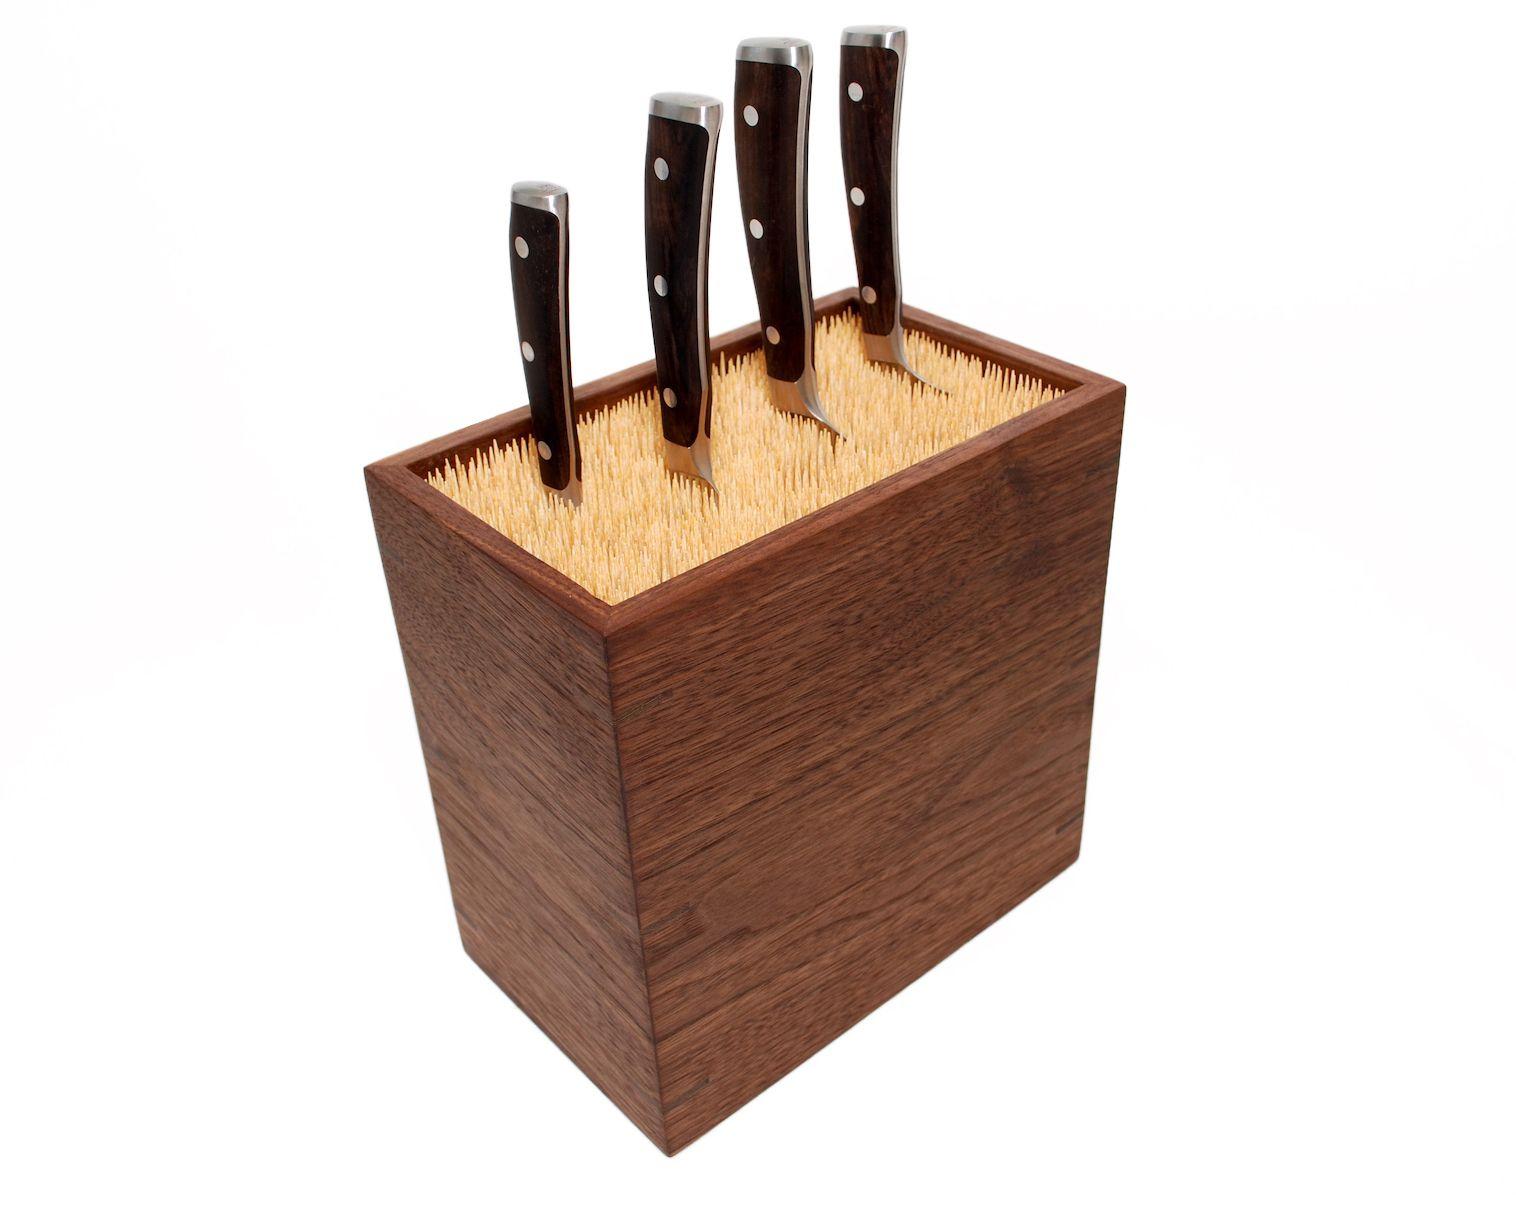 Bamboo Skewers Knife Block